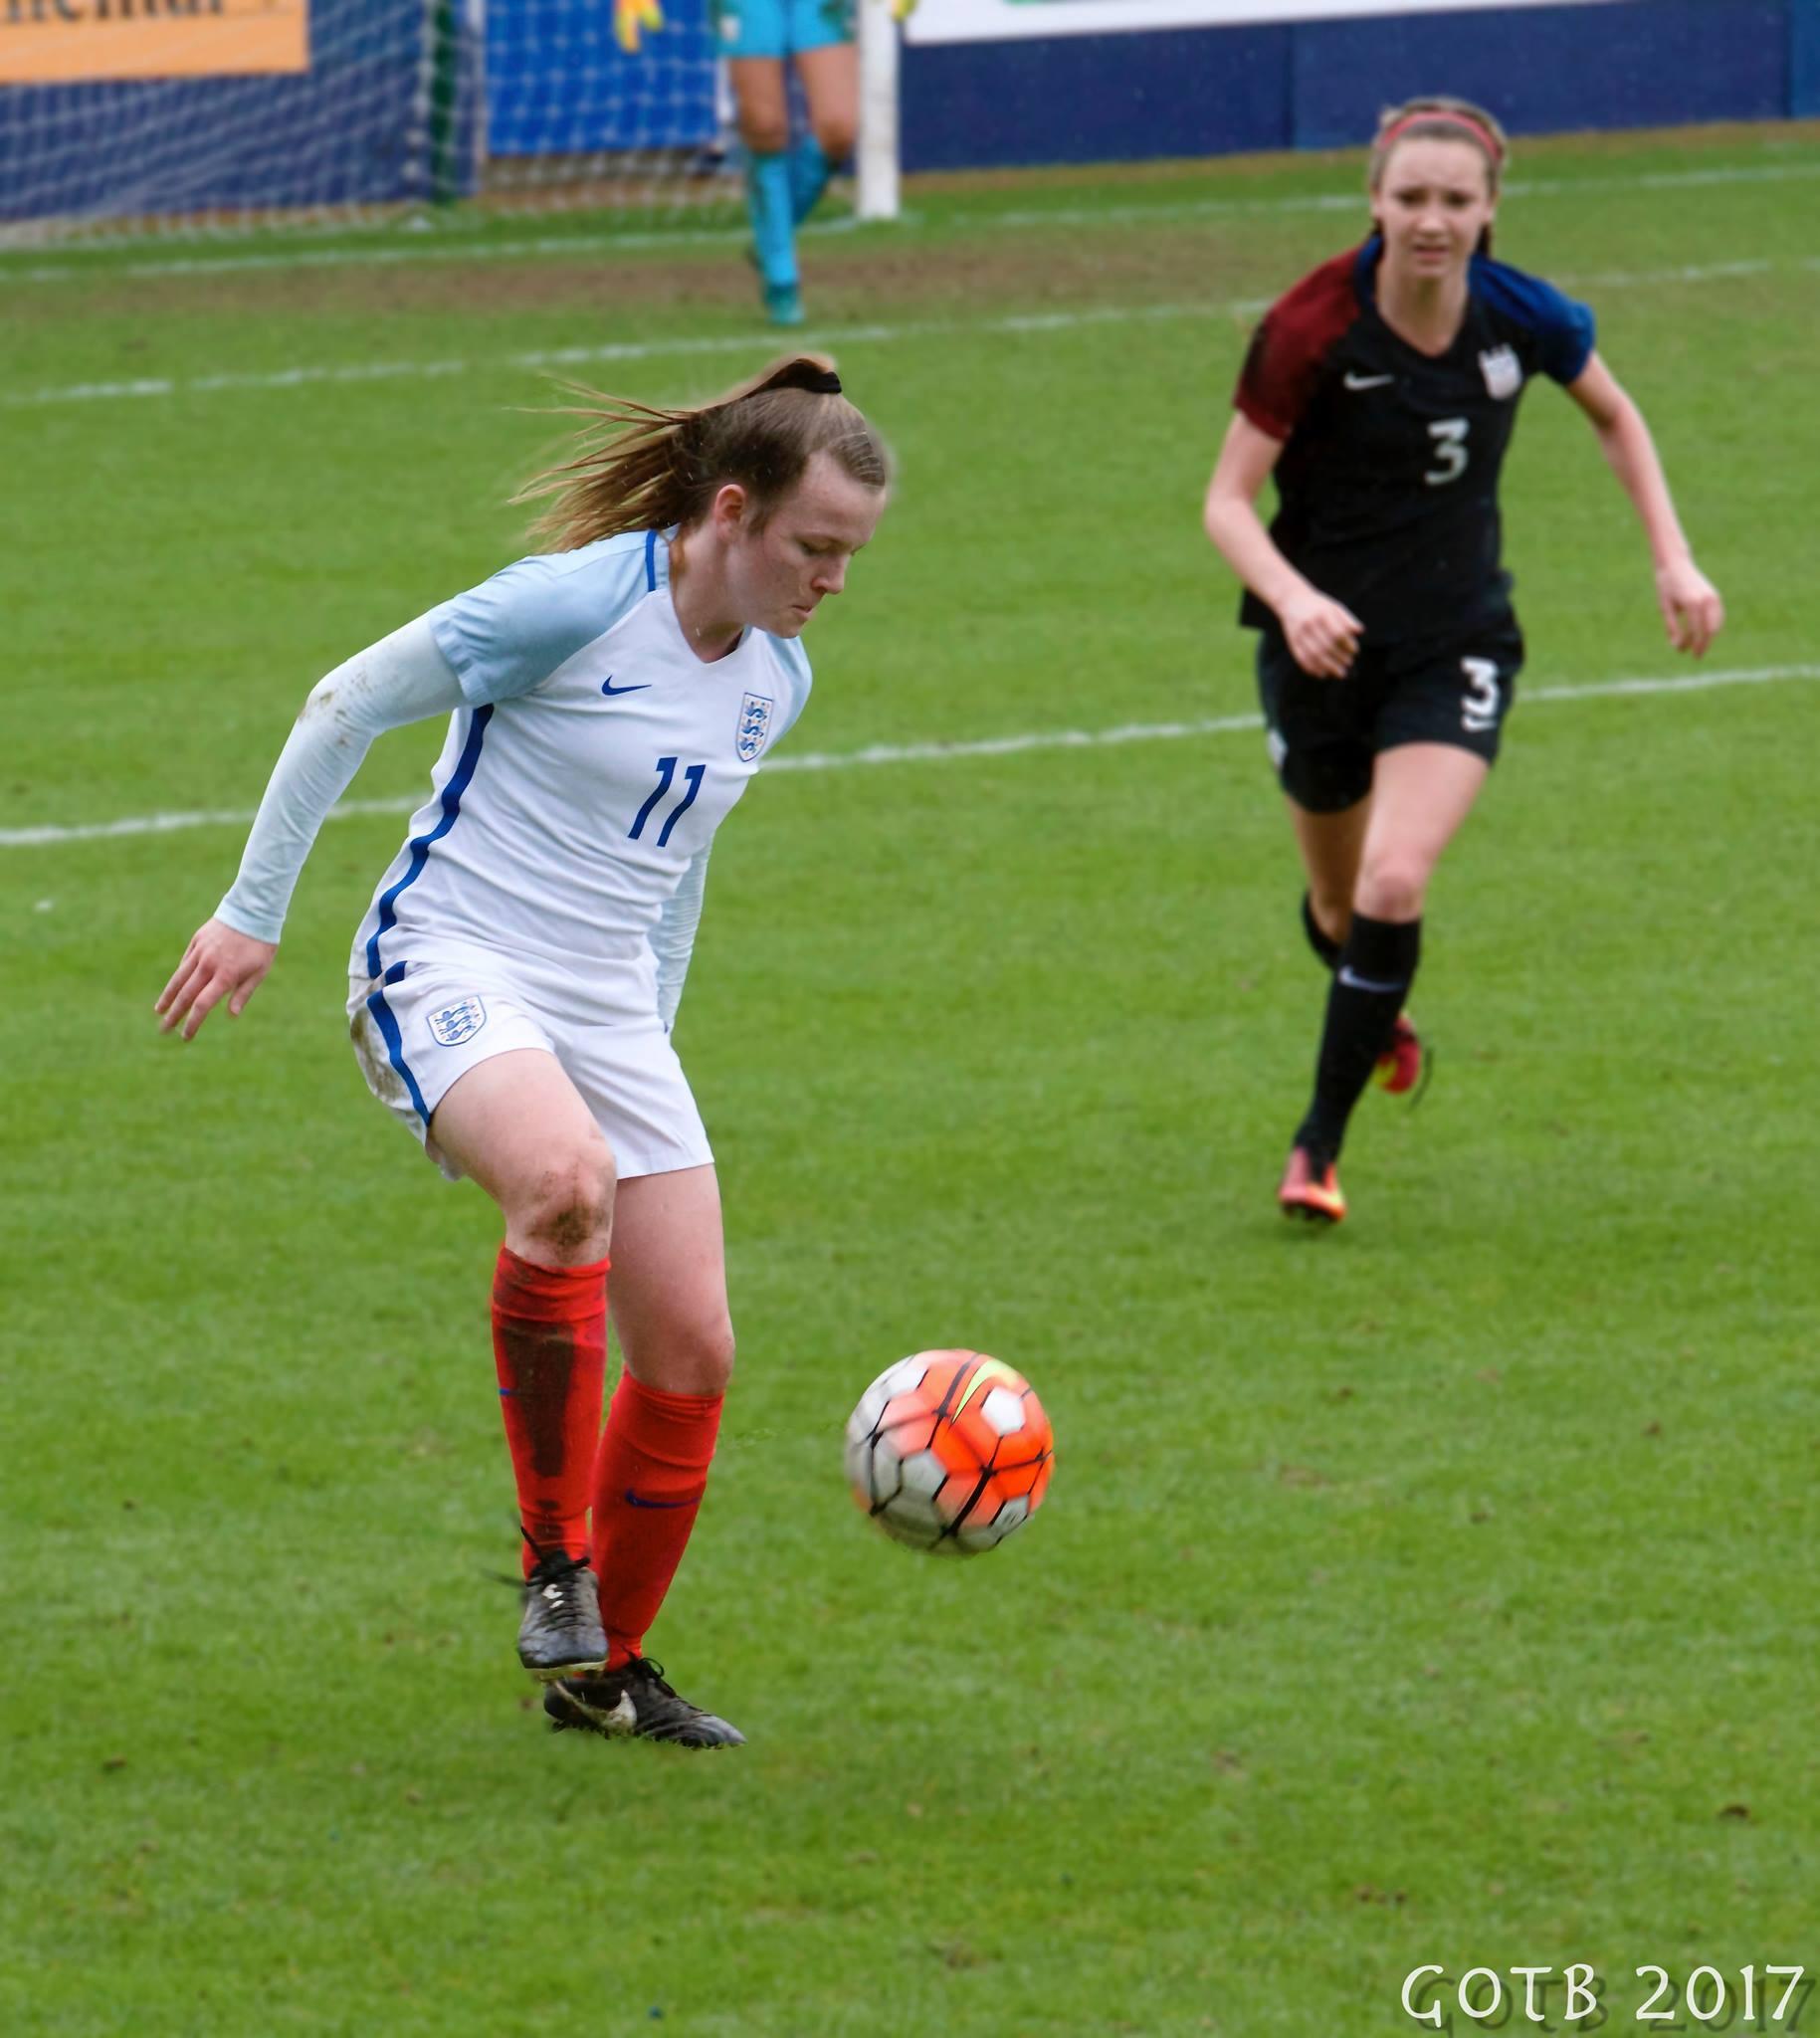 England U17s v USA, Friendly